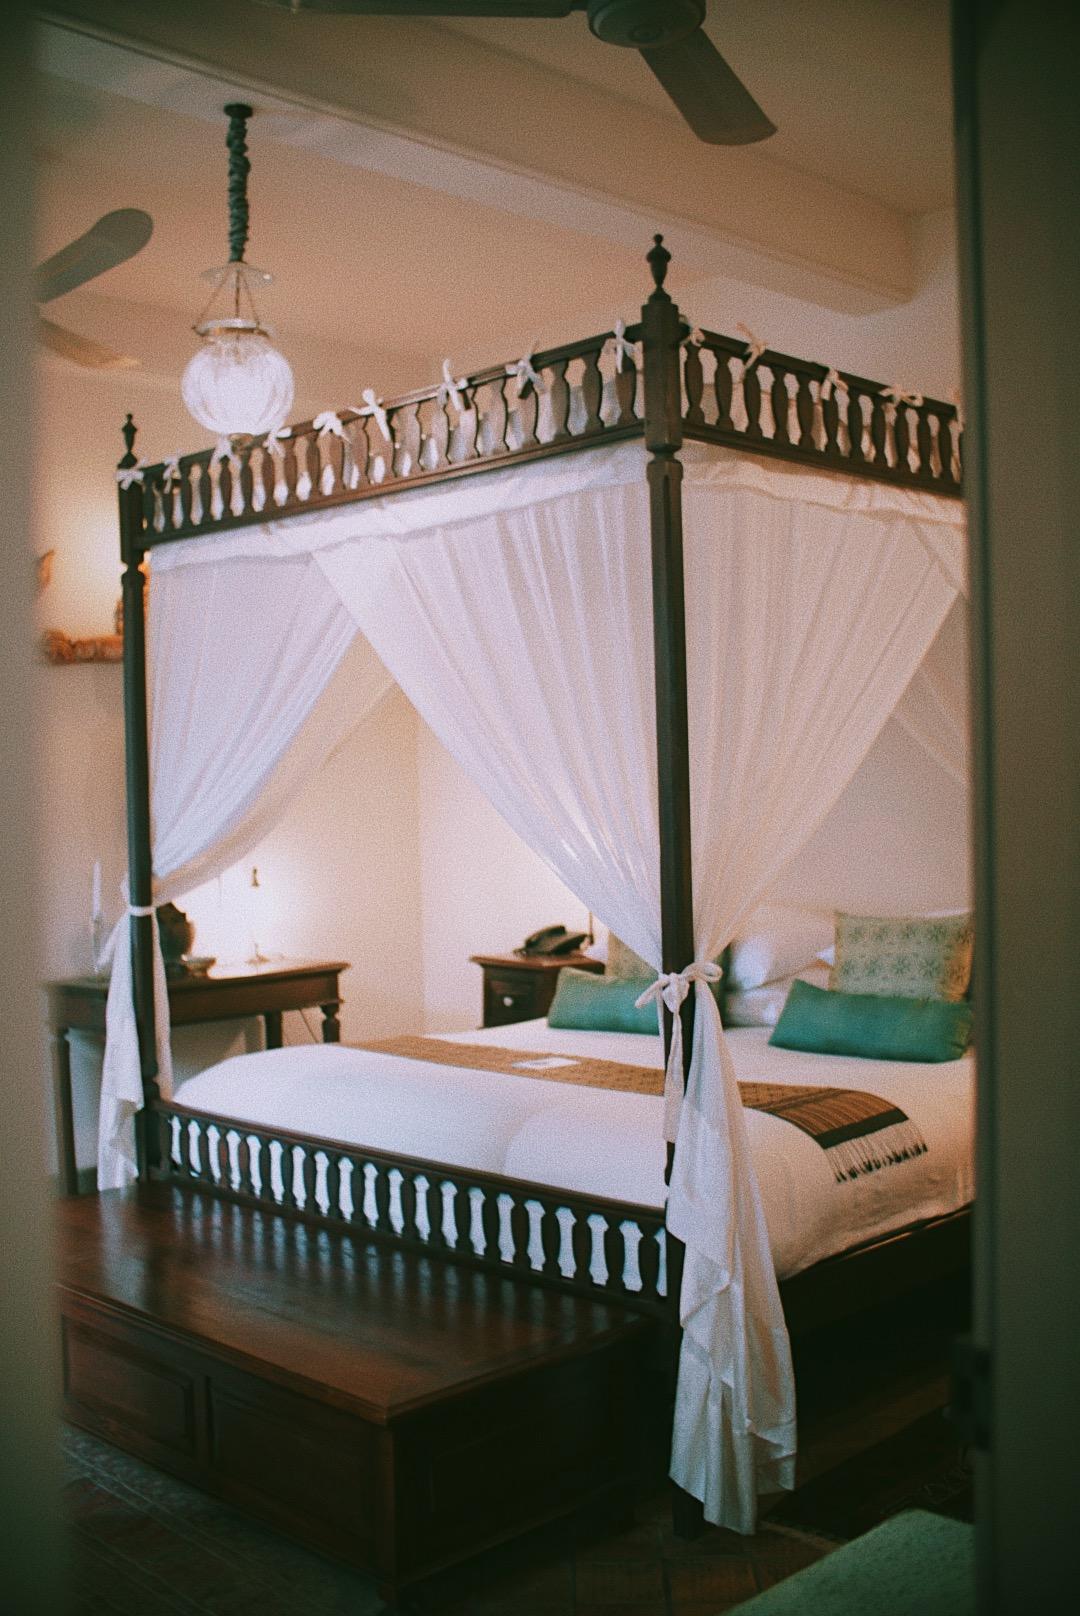 Kamar kami di Satri House hotel, Luang Prabang. Kental dengan suasana etnik Laos, tetapi dengan eksekusi yang lebih modern.